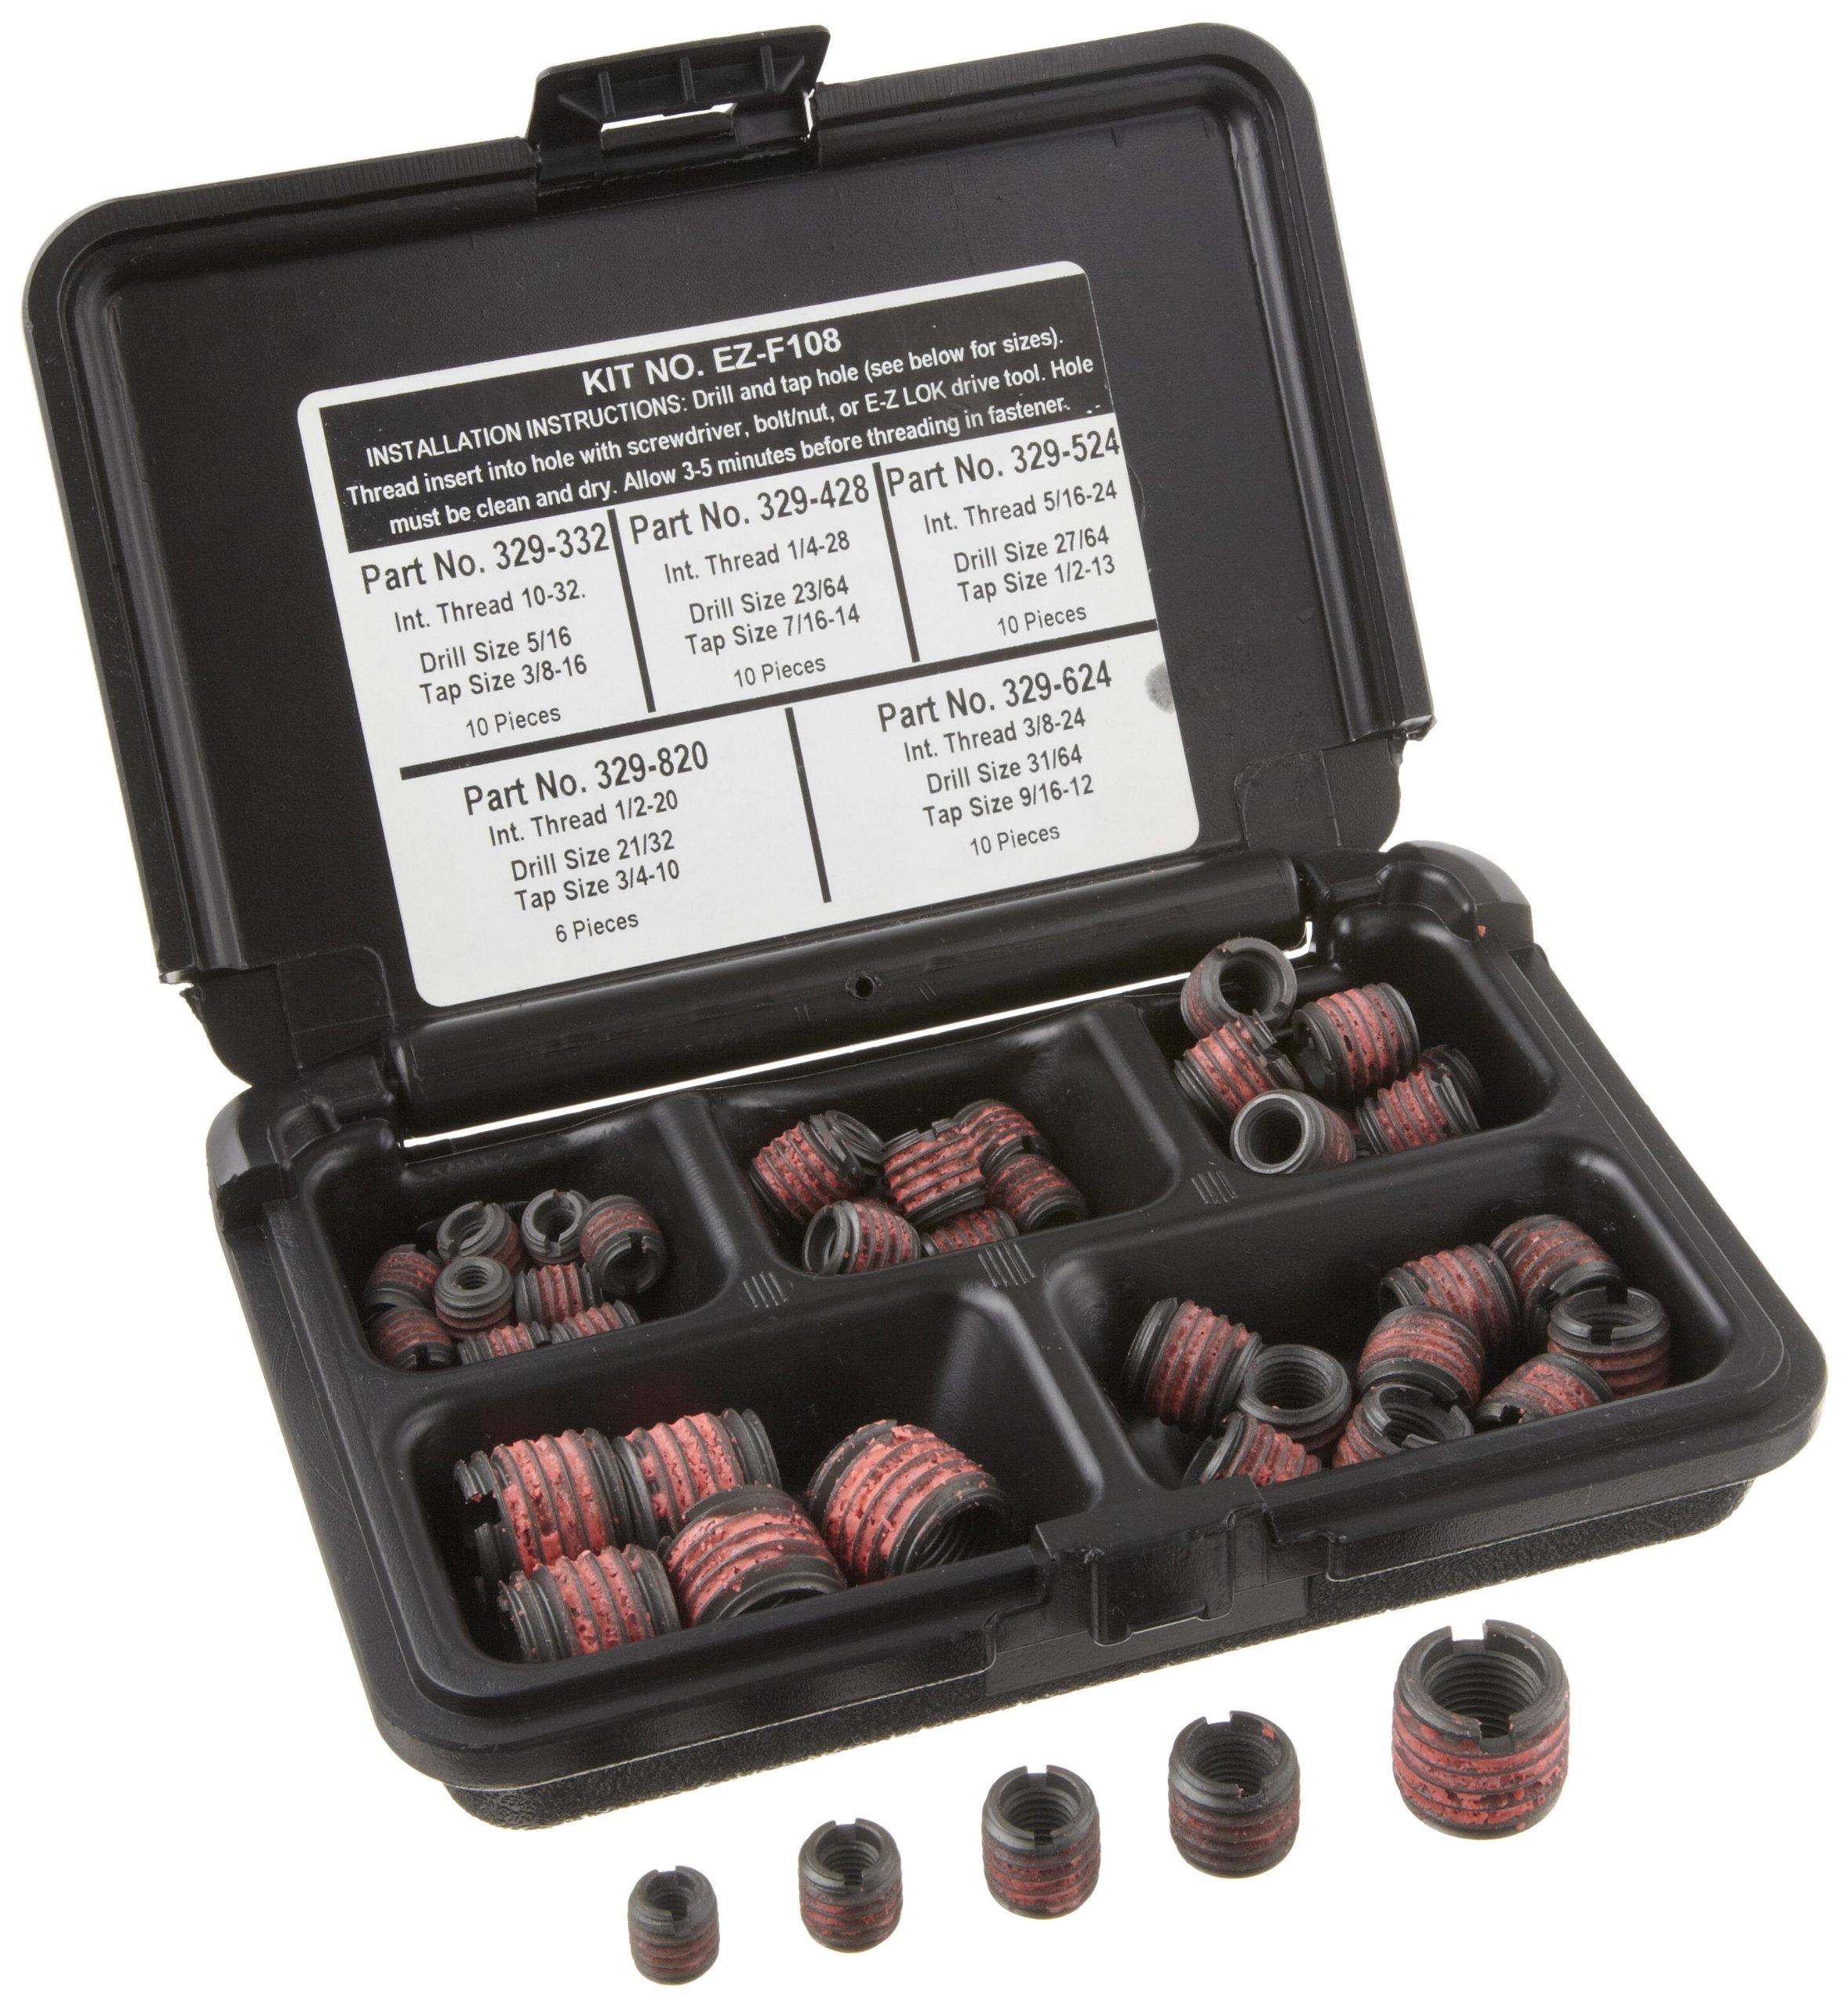 3//8-24 Installation Kit Black Oxide Steel E-Z LOK EZ-310-624 Threaded Inserts for Metal